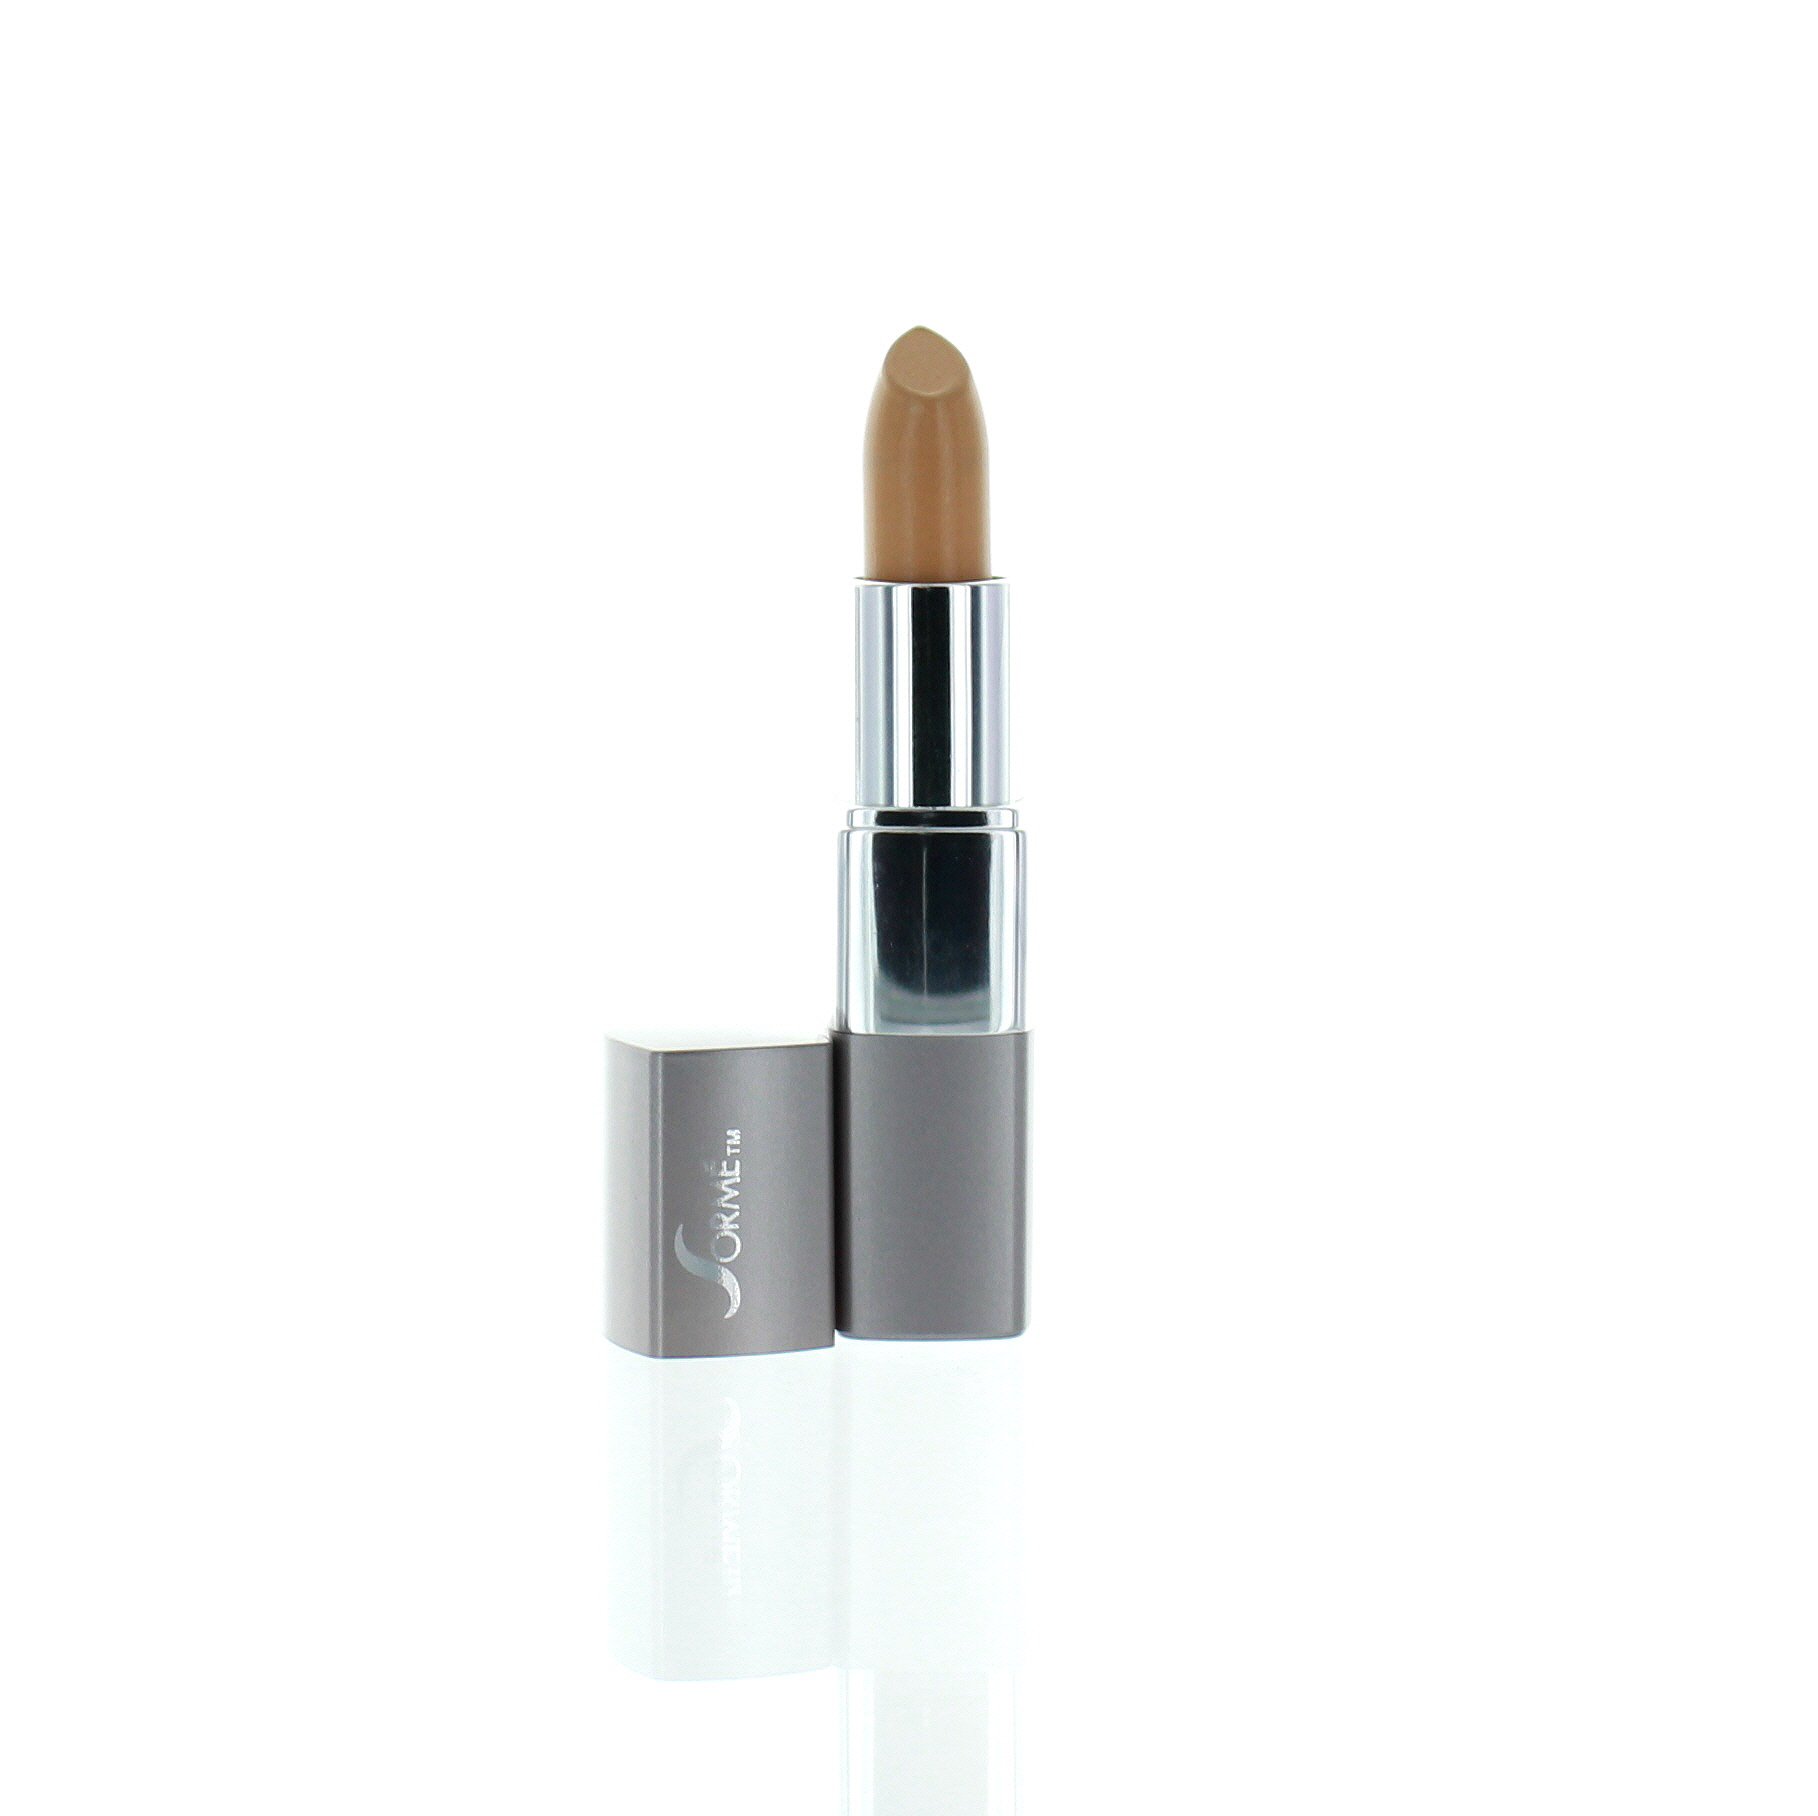 Sorme Cosmetics Believable Cover Natural Mineral Concealer